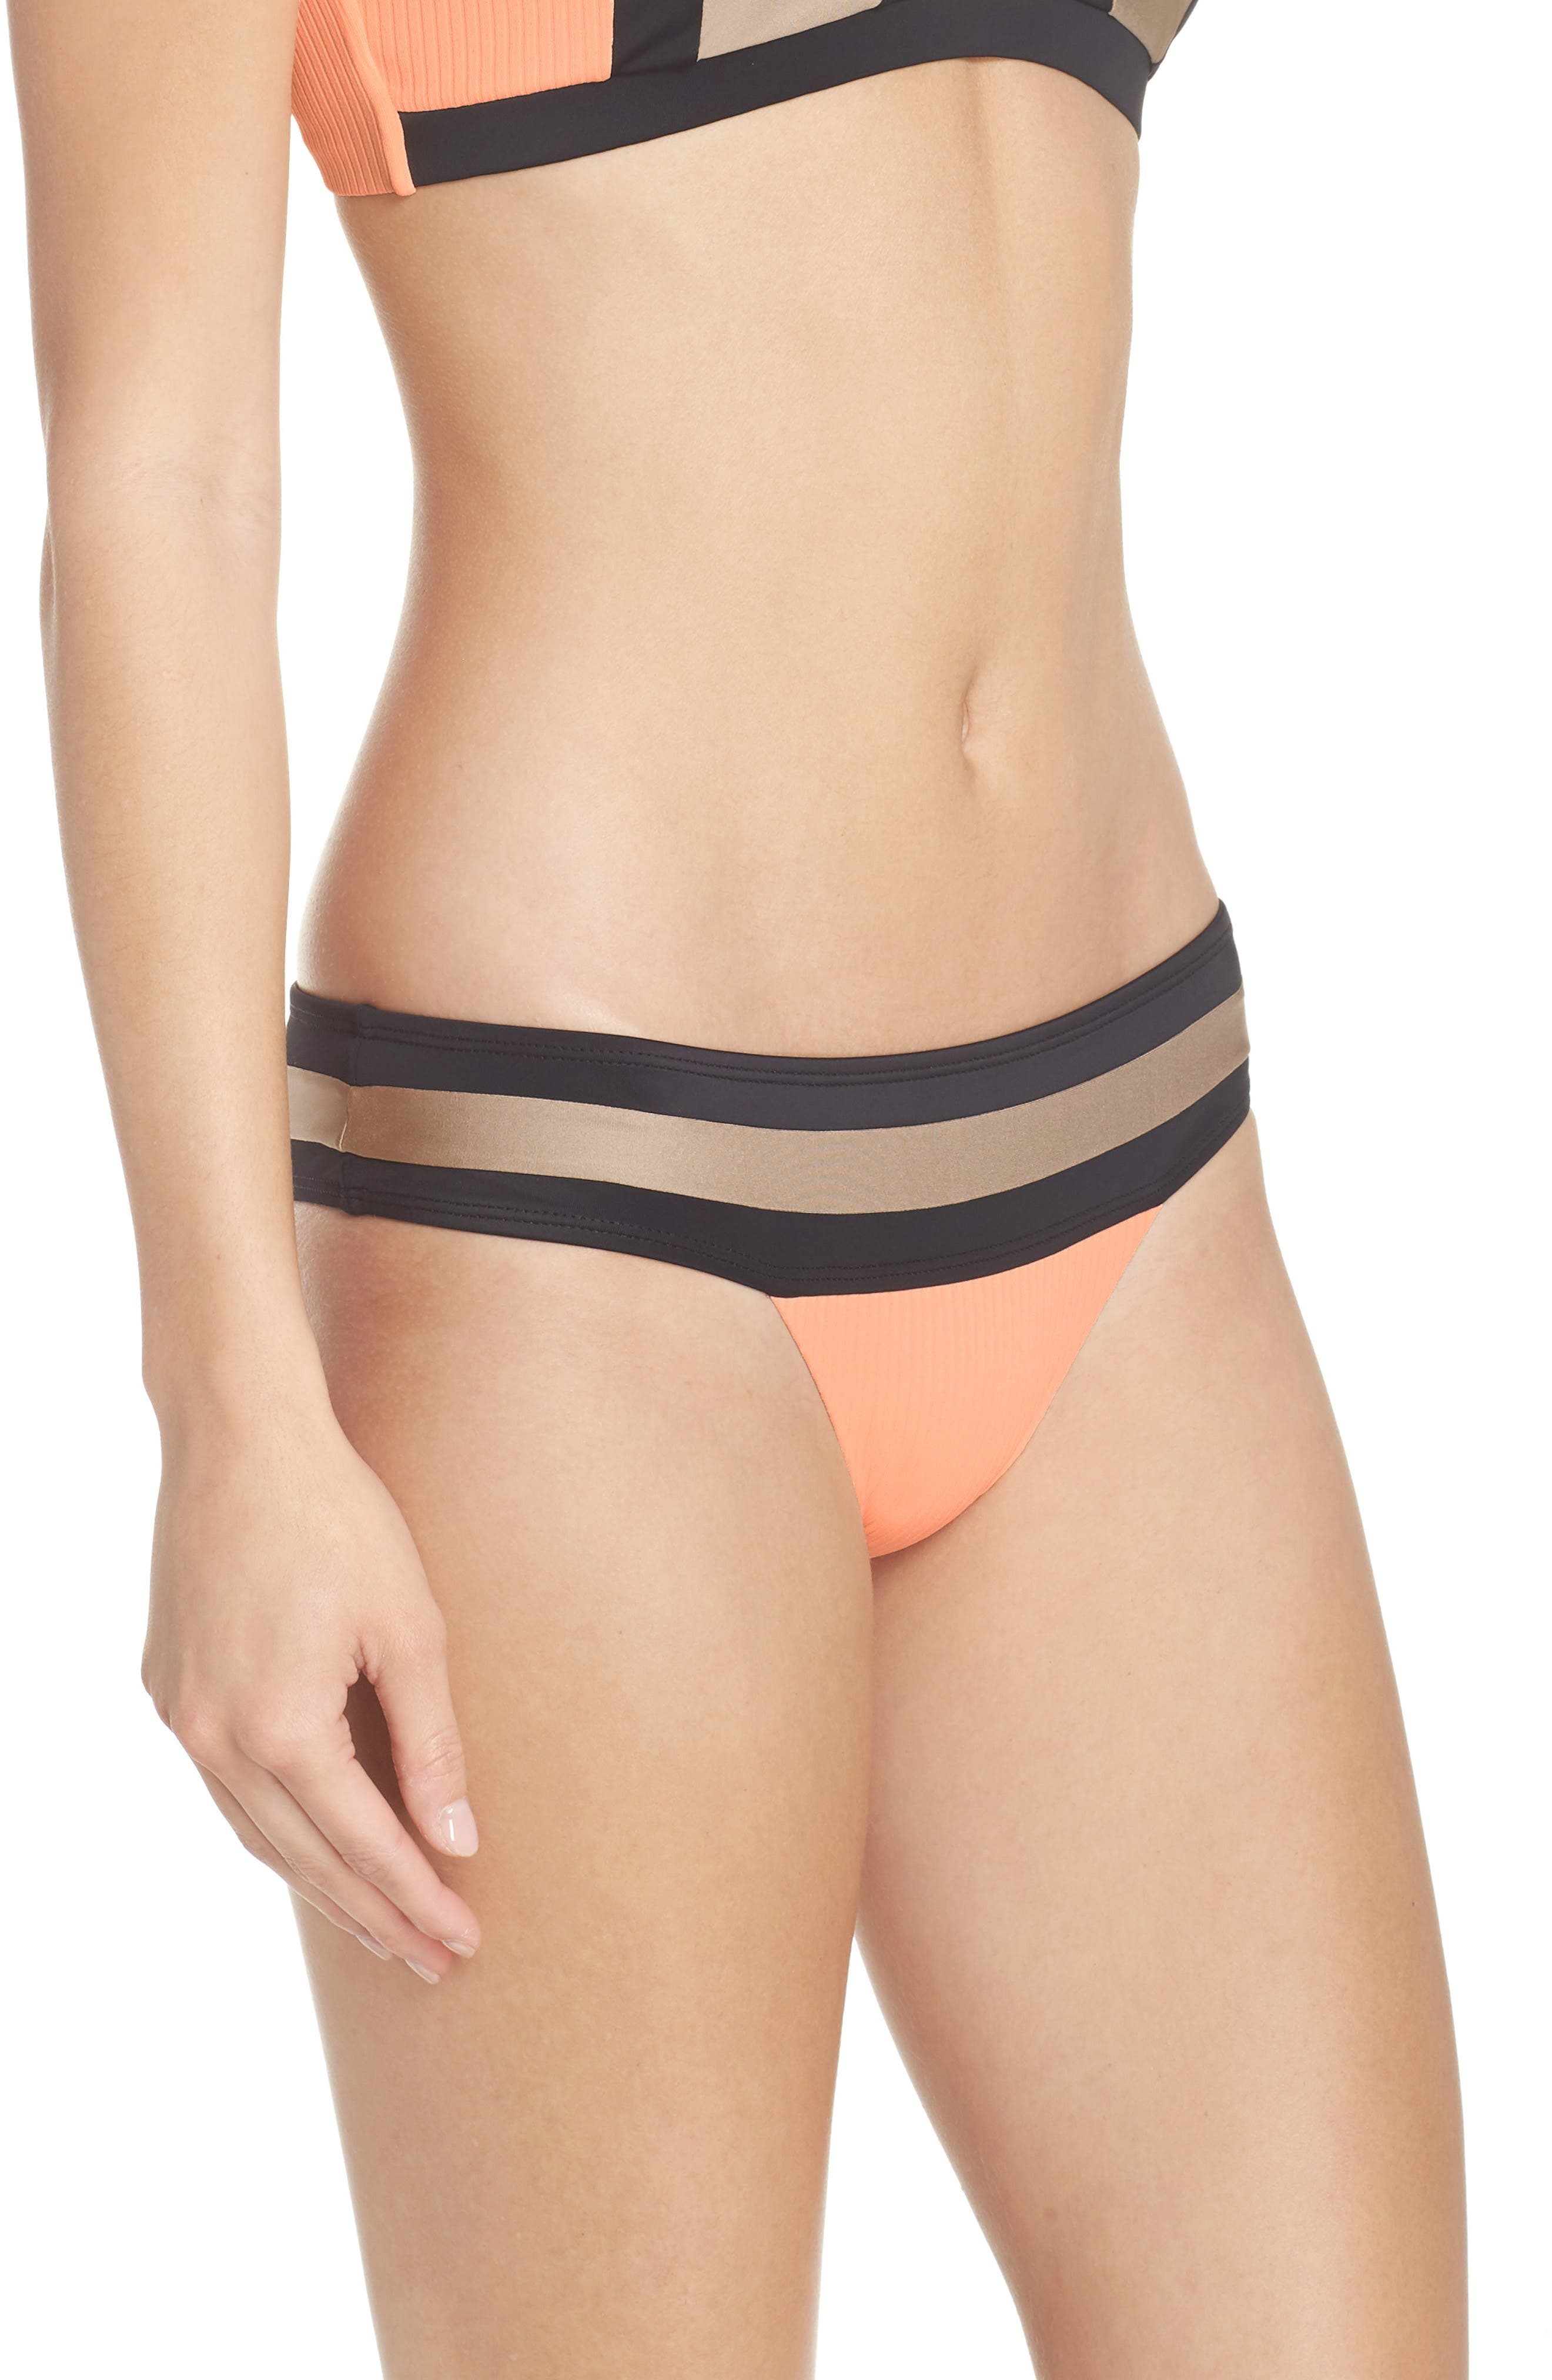 Banded Bikini Bottoms,                             Alternate thumbnail 3, color,                             Sandstone